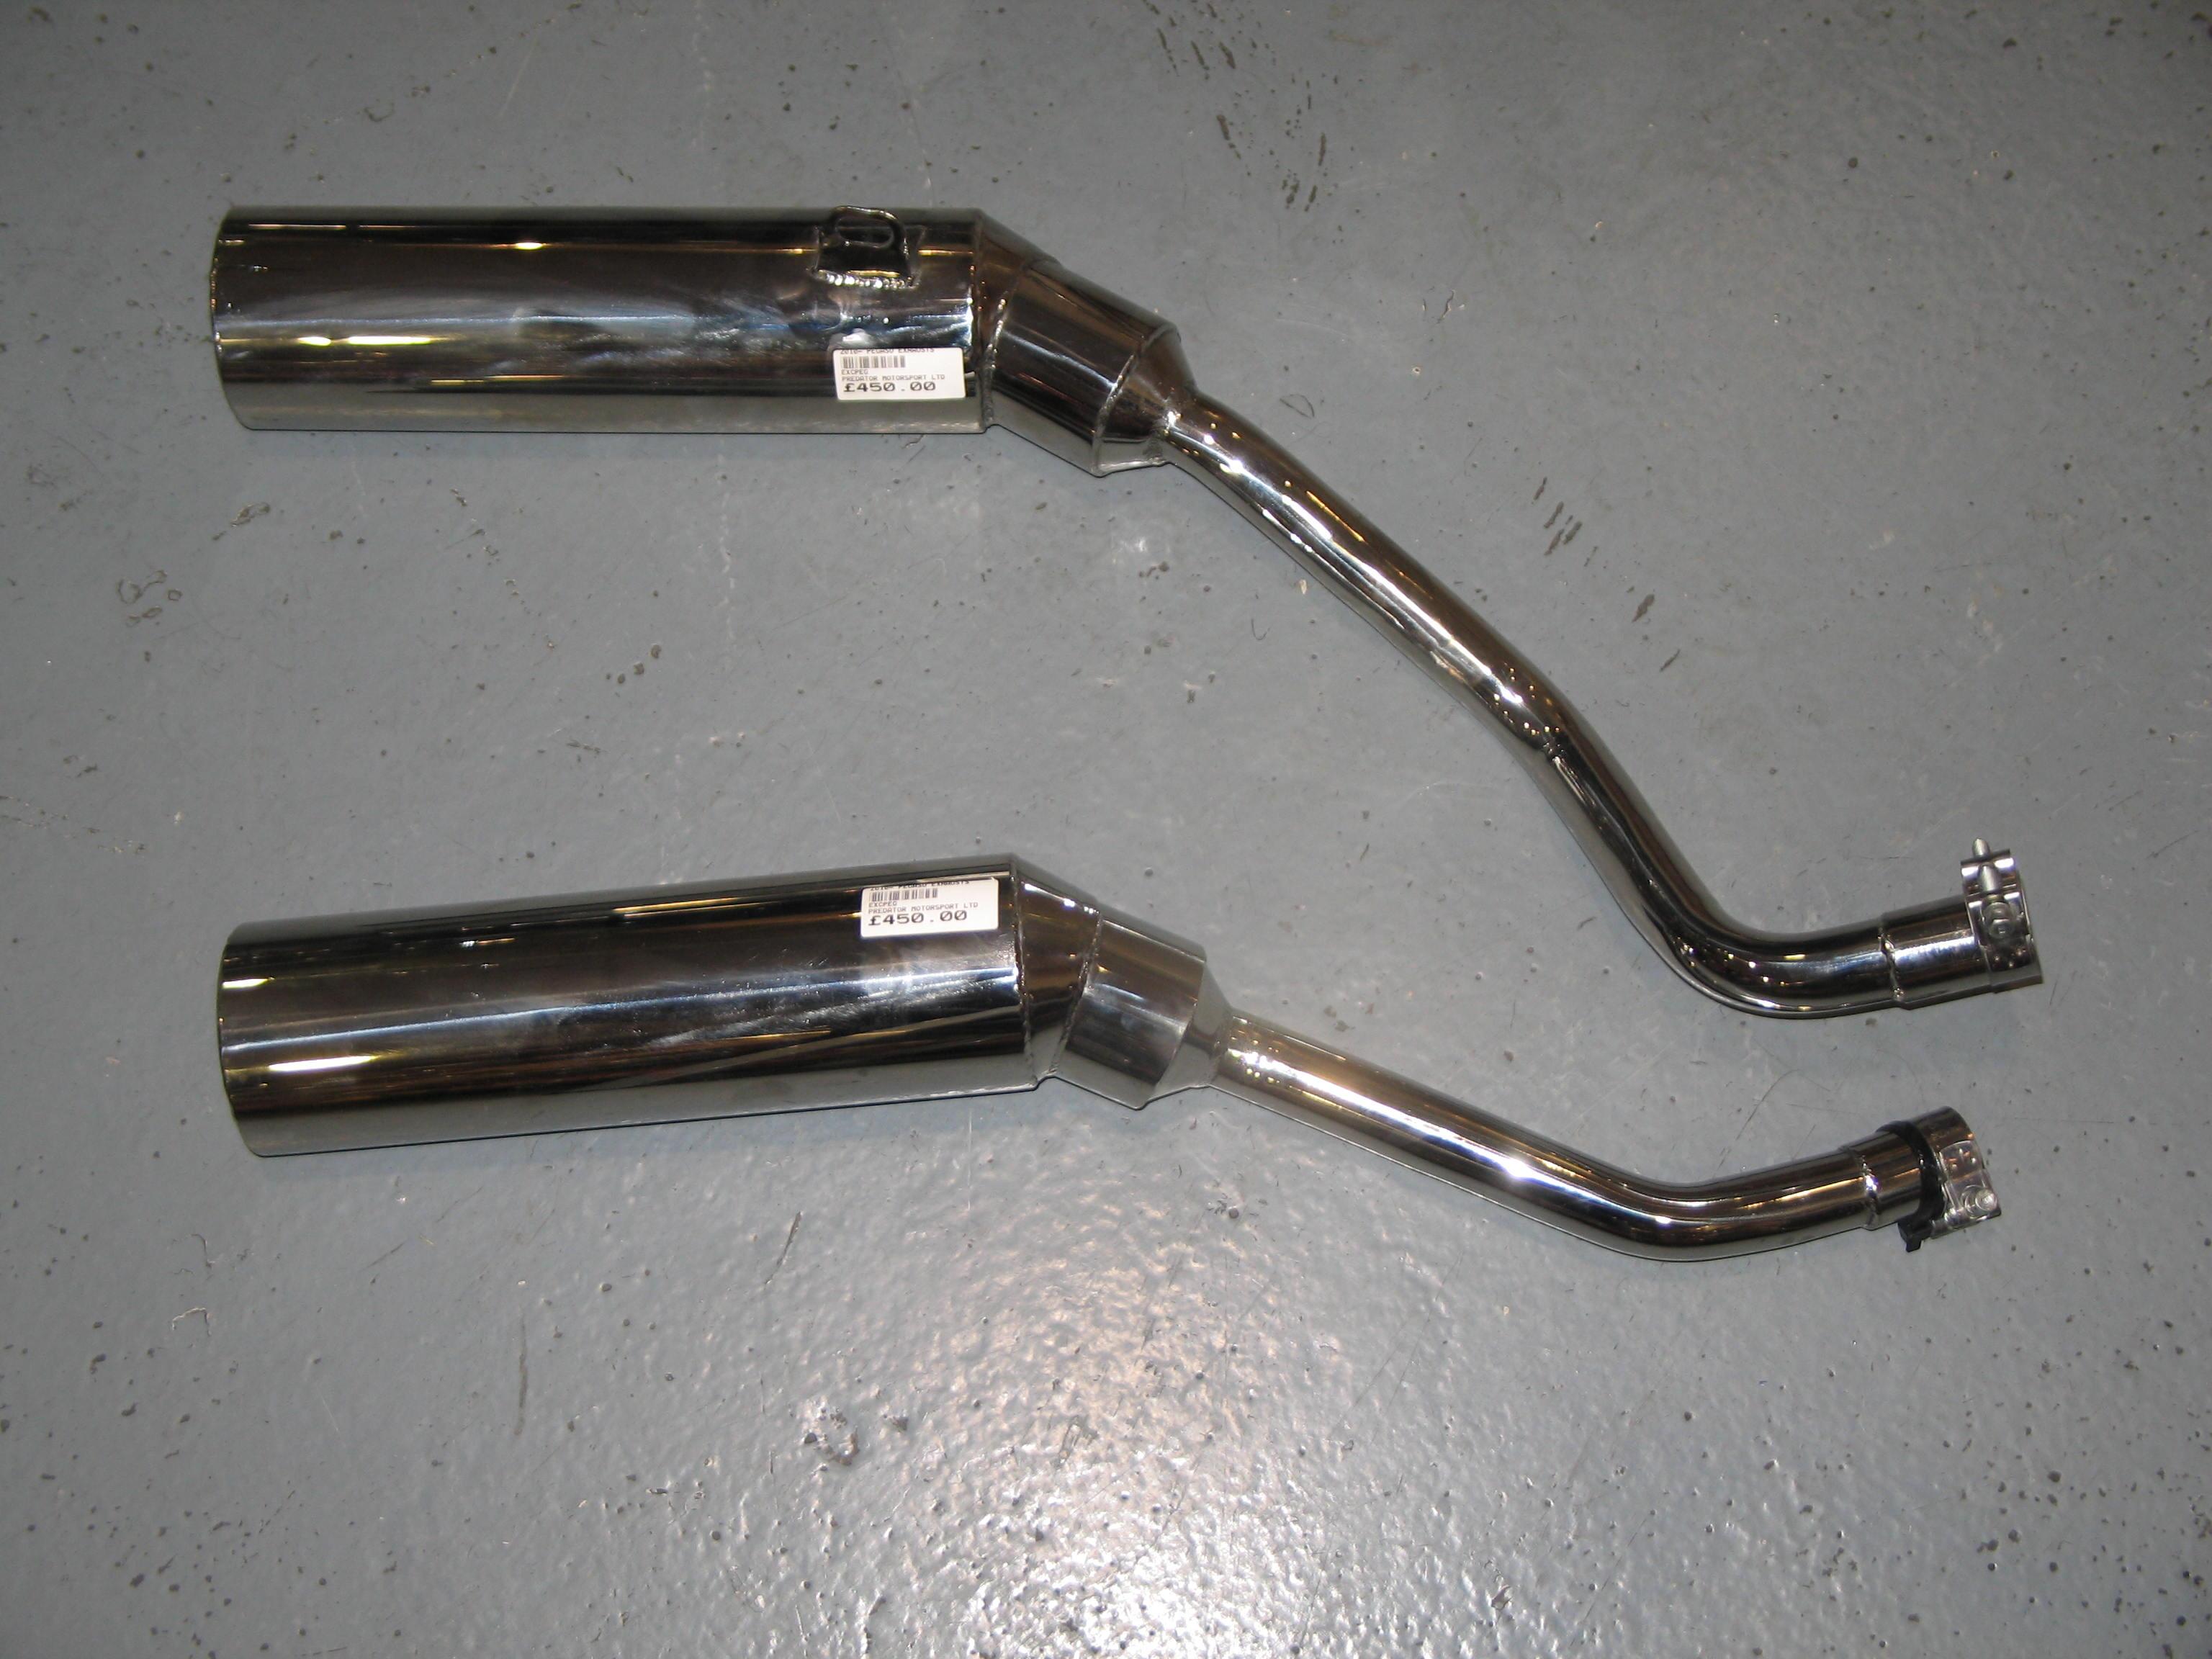 APRILIA PEGASO MK4 (YAMAHA ENGINE MODEL) PREDATOR SILENCERS (PAIR)